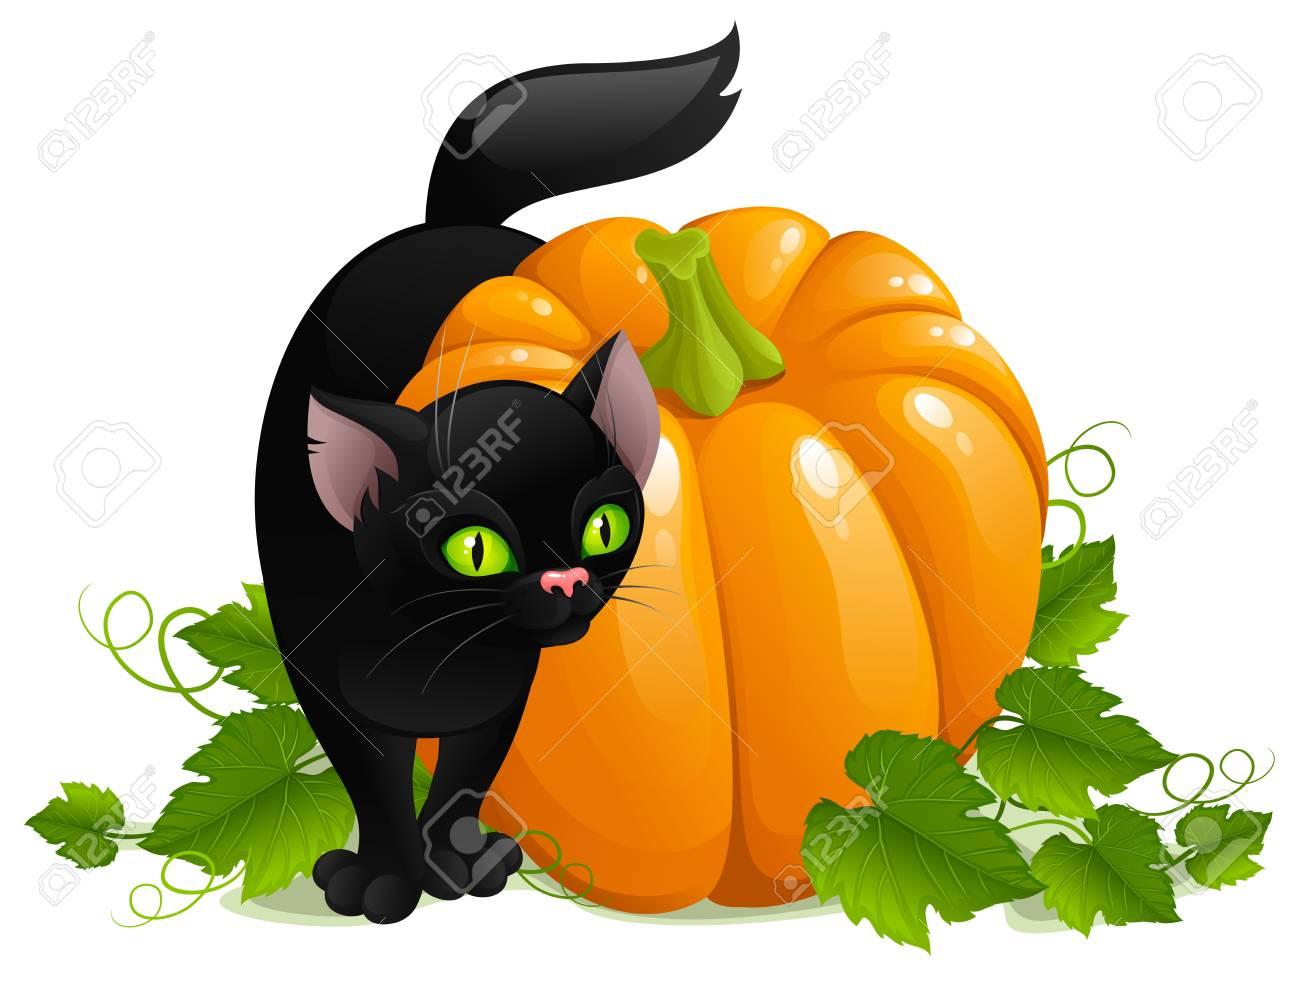 Black cat and pumpkin Stock Photo - 3631999